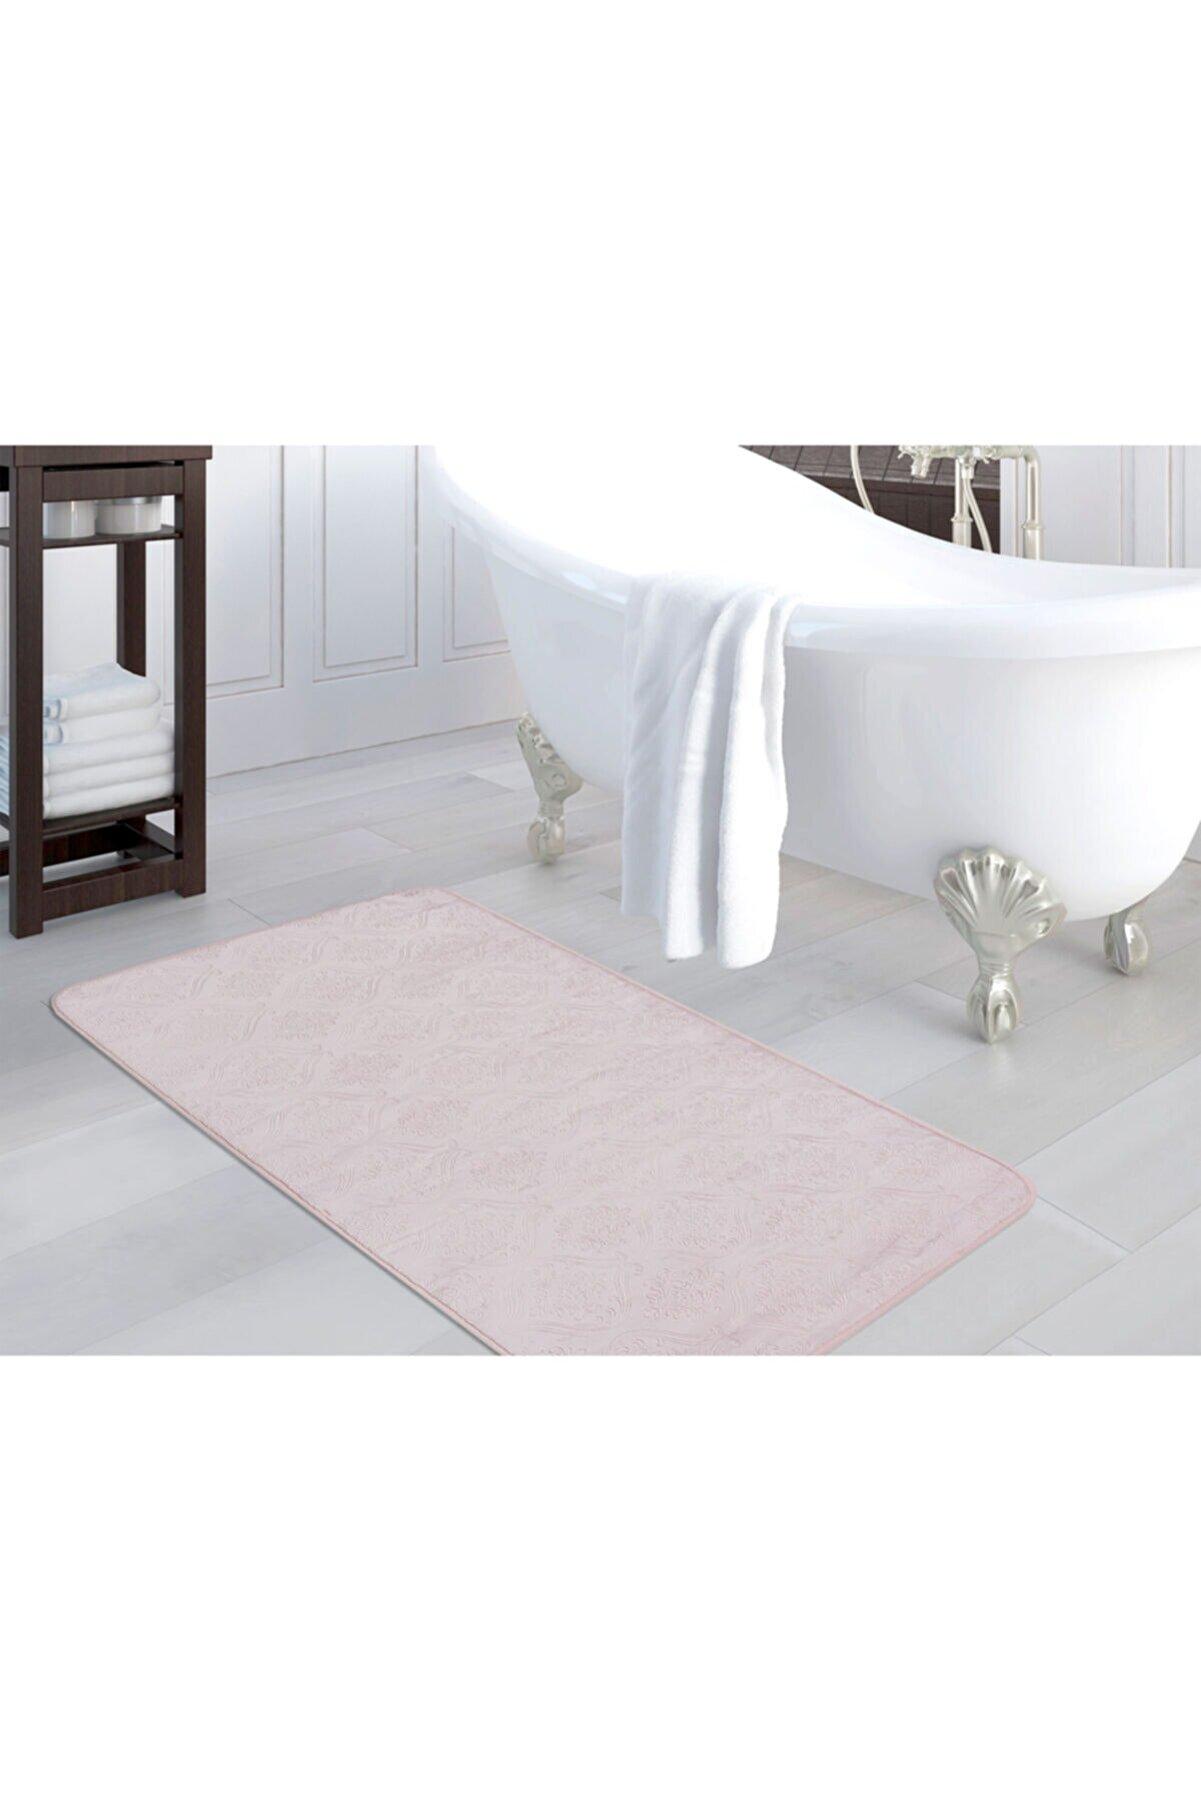 Madame Coco Emboss Banyo Paspası - Mürdüm - 120x180 Cm